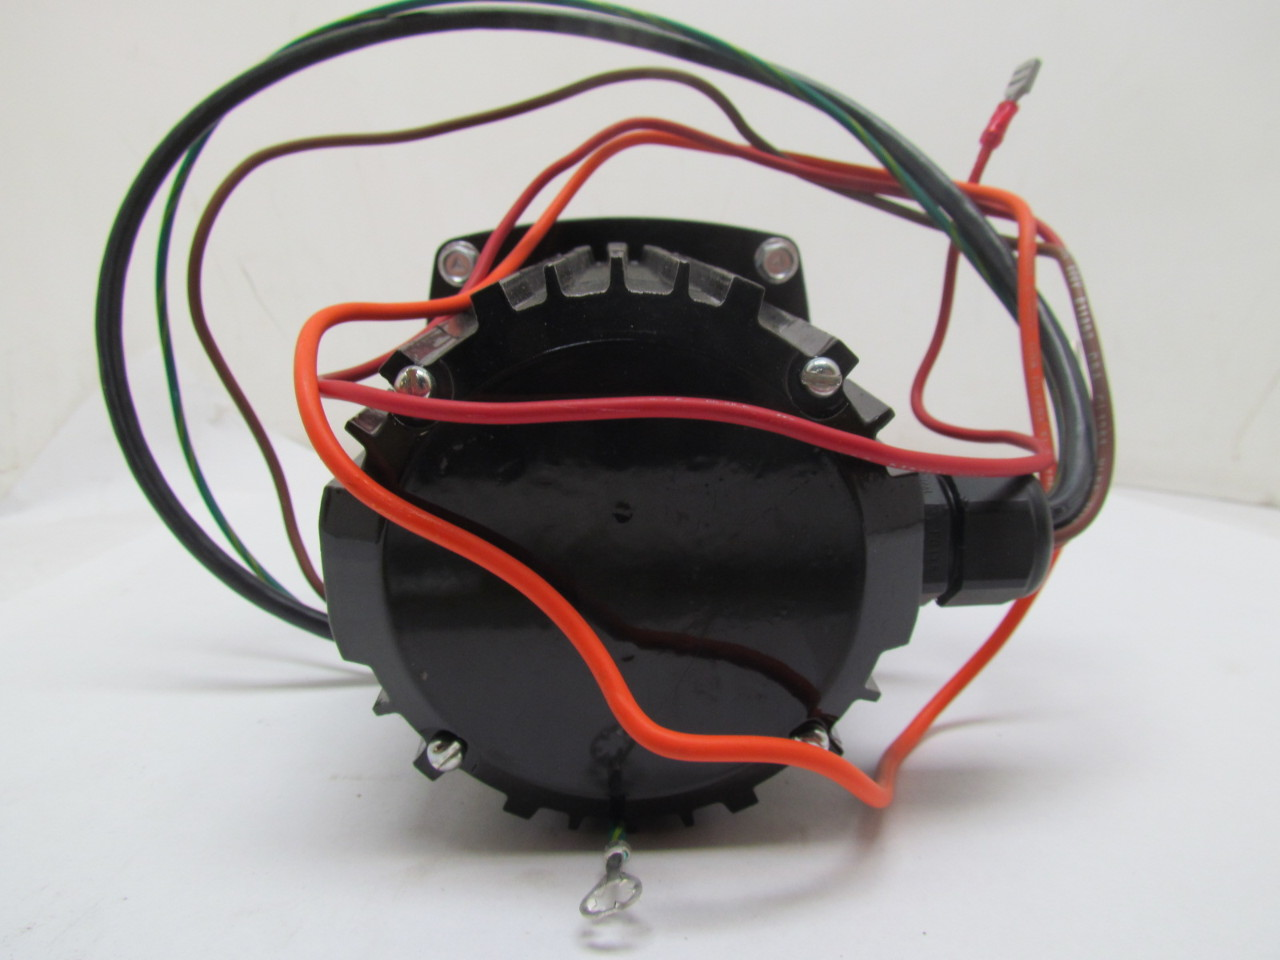 58762 bodine electric 34b6bebl f3 24v gearmotor 18amp 3 8hp 125rpm 201 ratio 9 bodine dc motor wiring diagram turcolea com philips bodine lp550 wiring diagram at soozxer.org